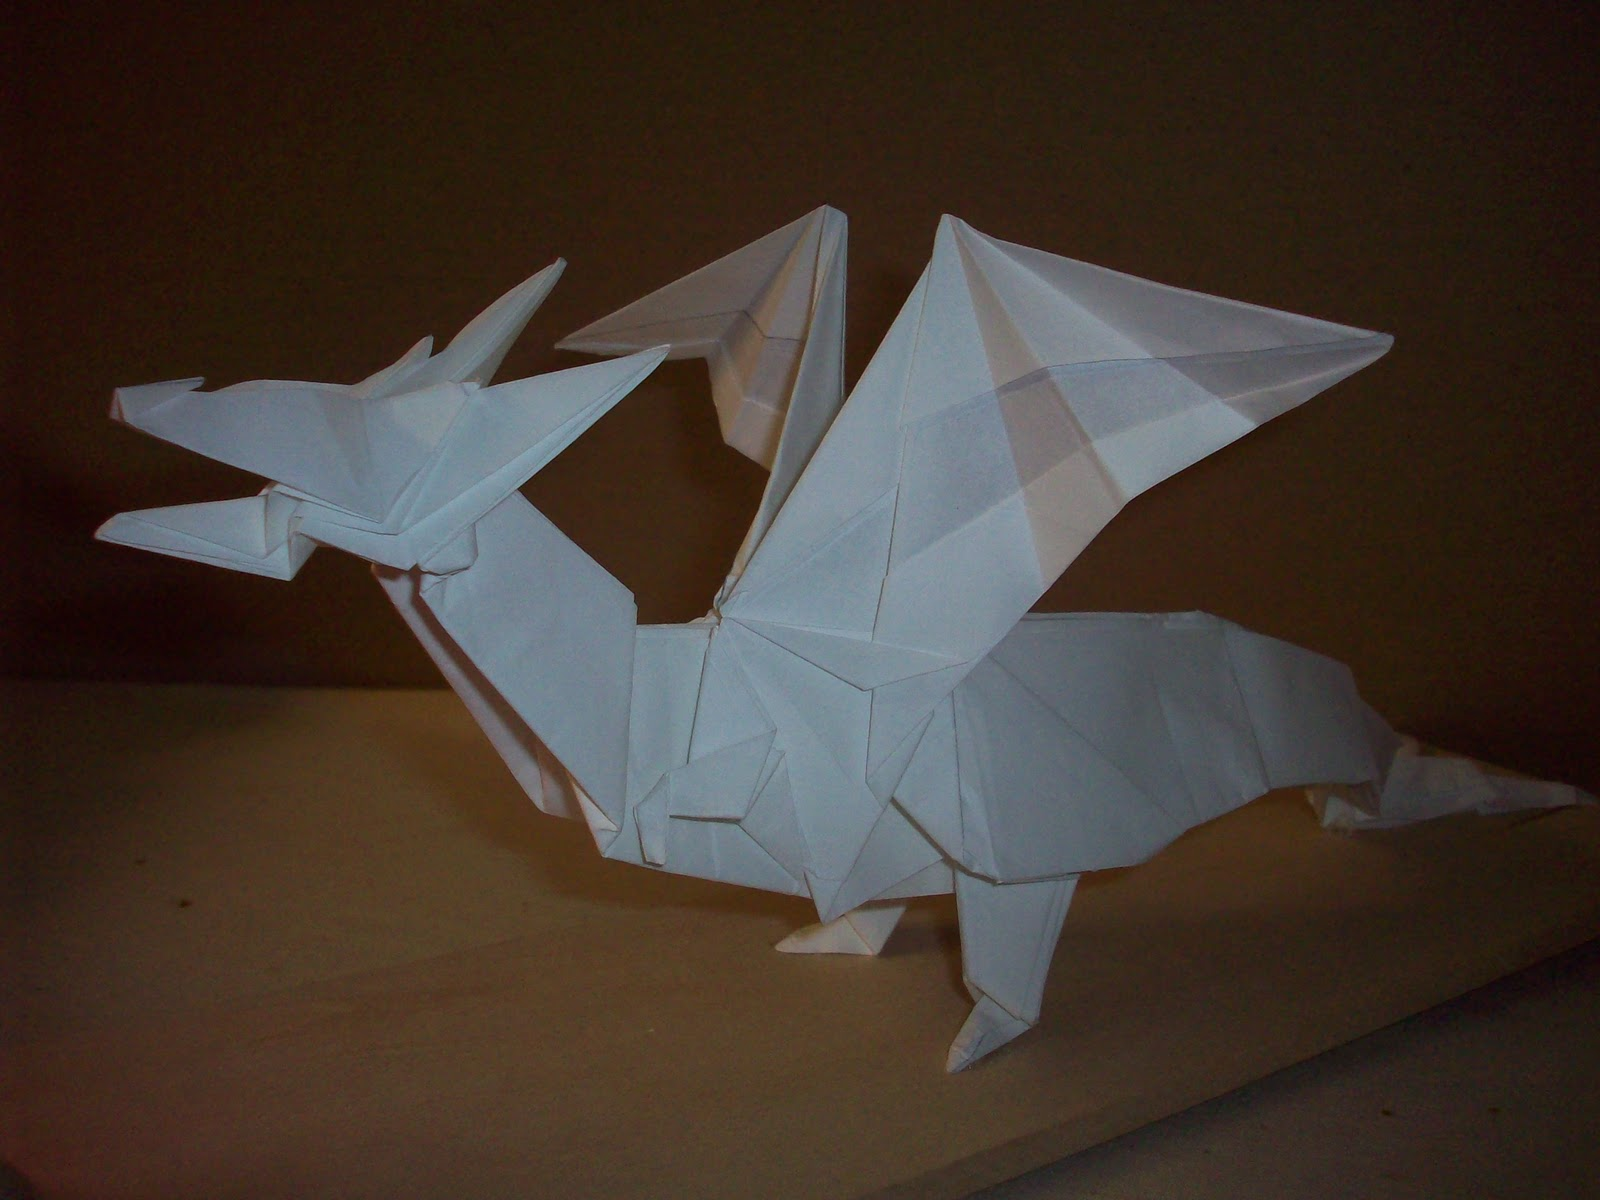 Doodle-ee-doo: Origami Dragon - photo#47